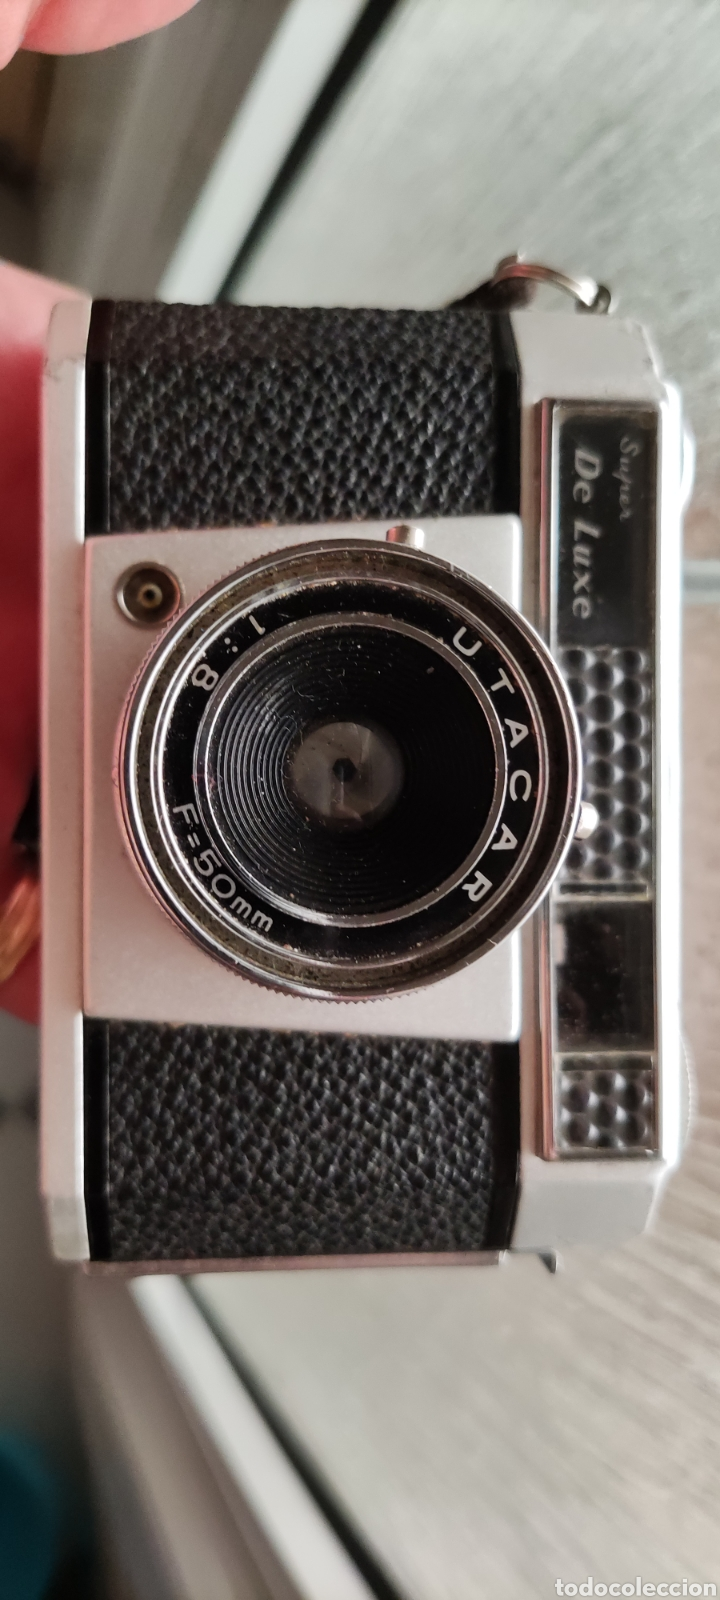 Cámara de fotos: Antigua cámara fotográfica Anny 35 utacar 50mm - Foto 12 - 268461789